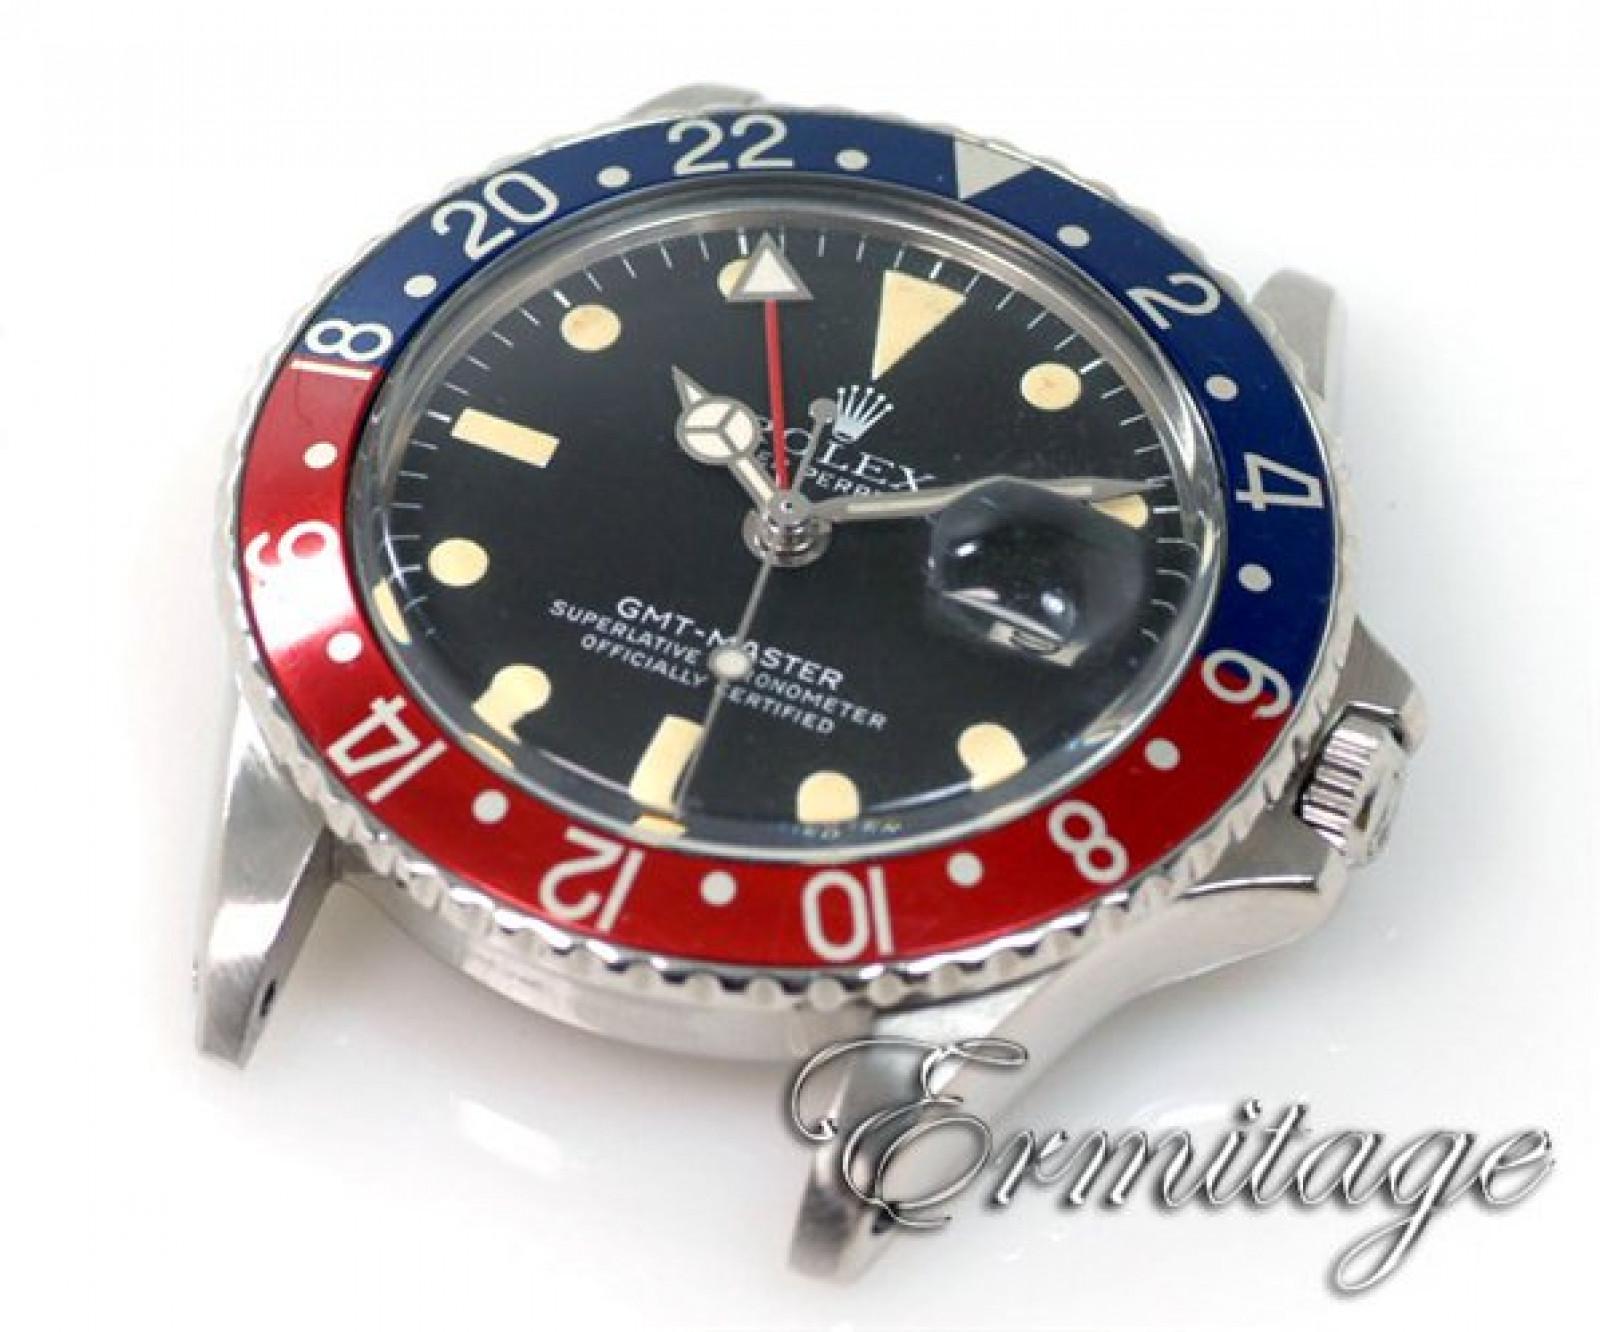 Vintage Rolex GMT-Master 1675 Pepsi Bezel